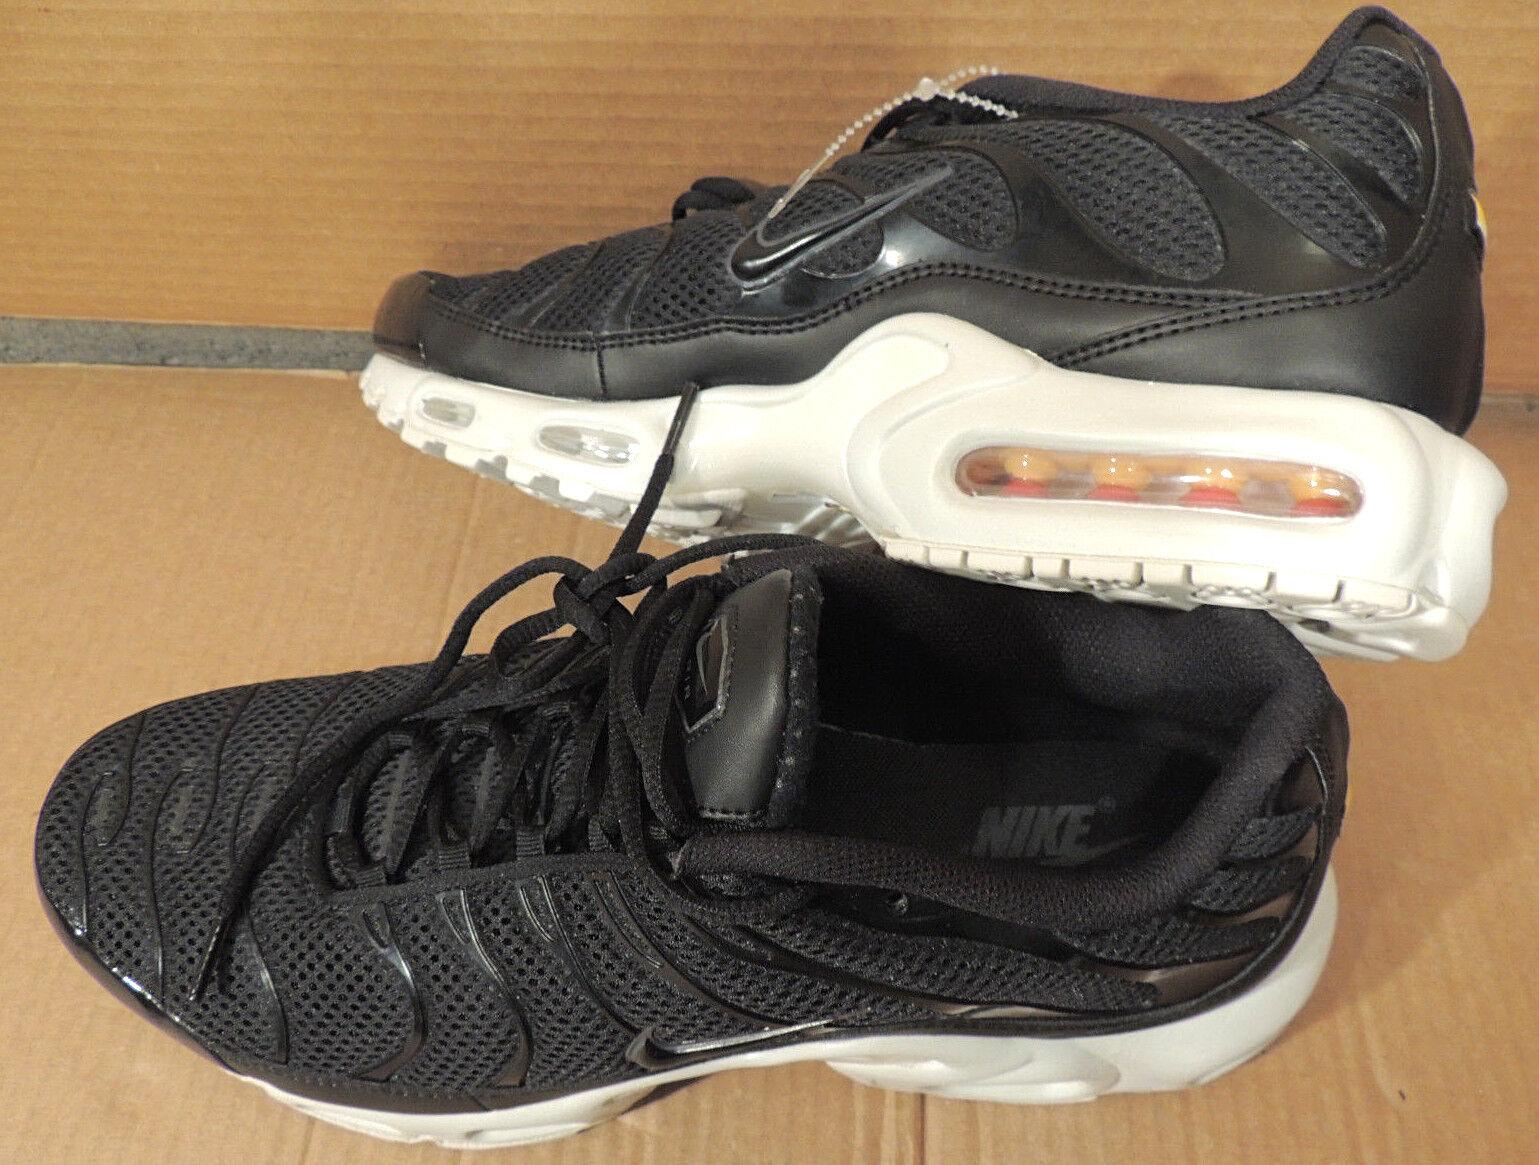 new arrival e8ccb 75742 Nike Air Max Plus Breeze TN Running shoes Black Black Black White  898014-001 Size